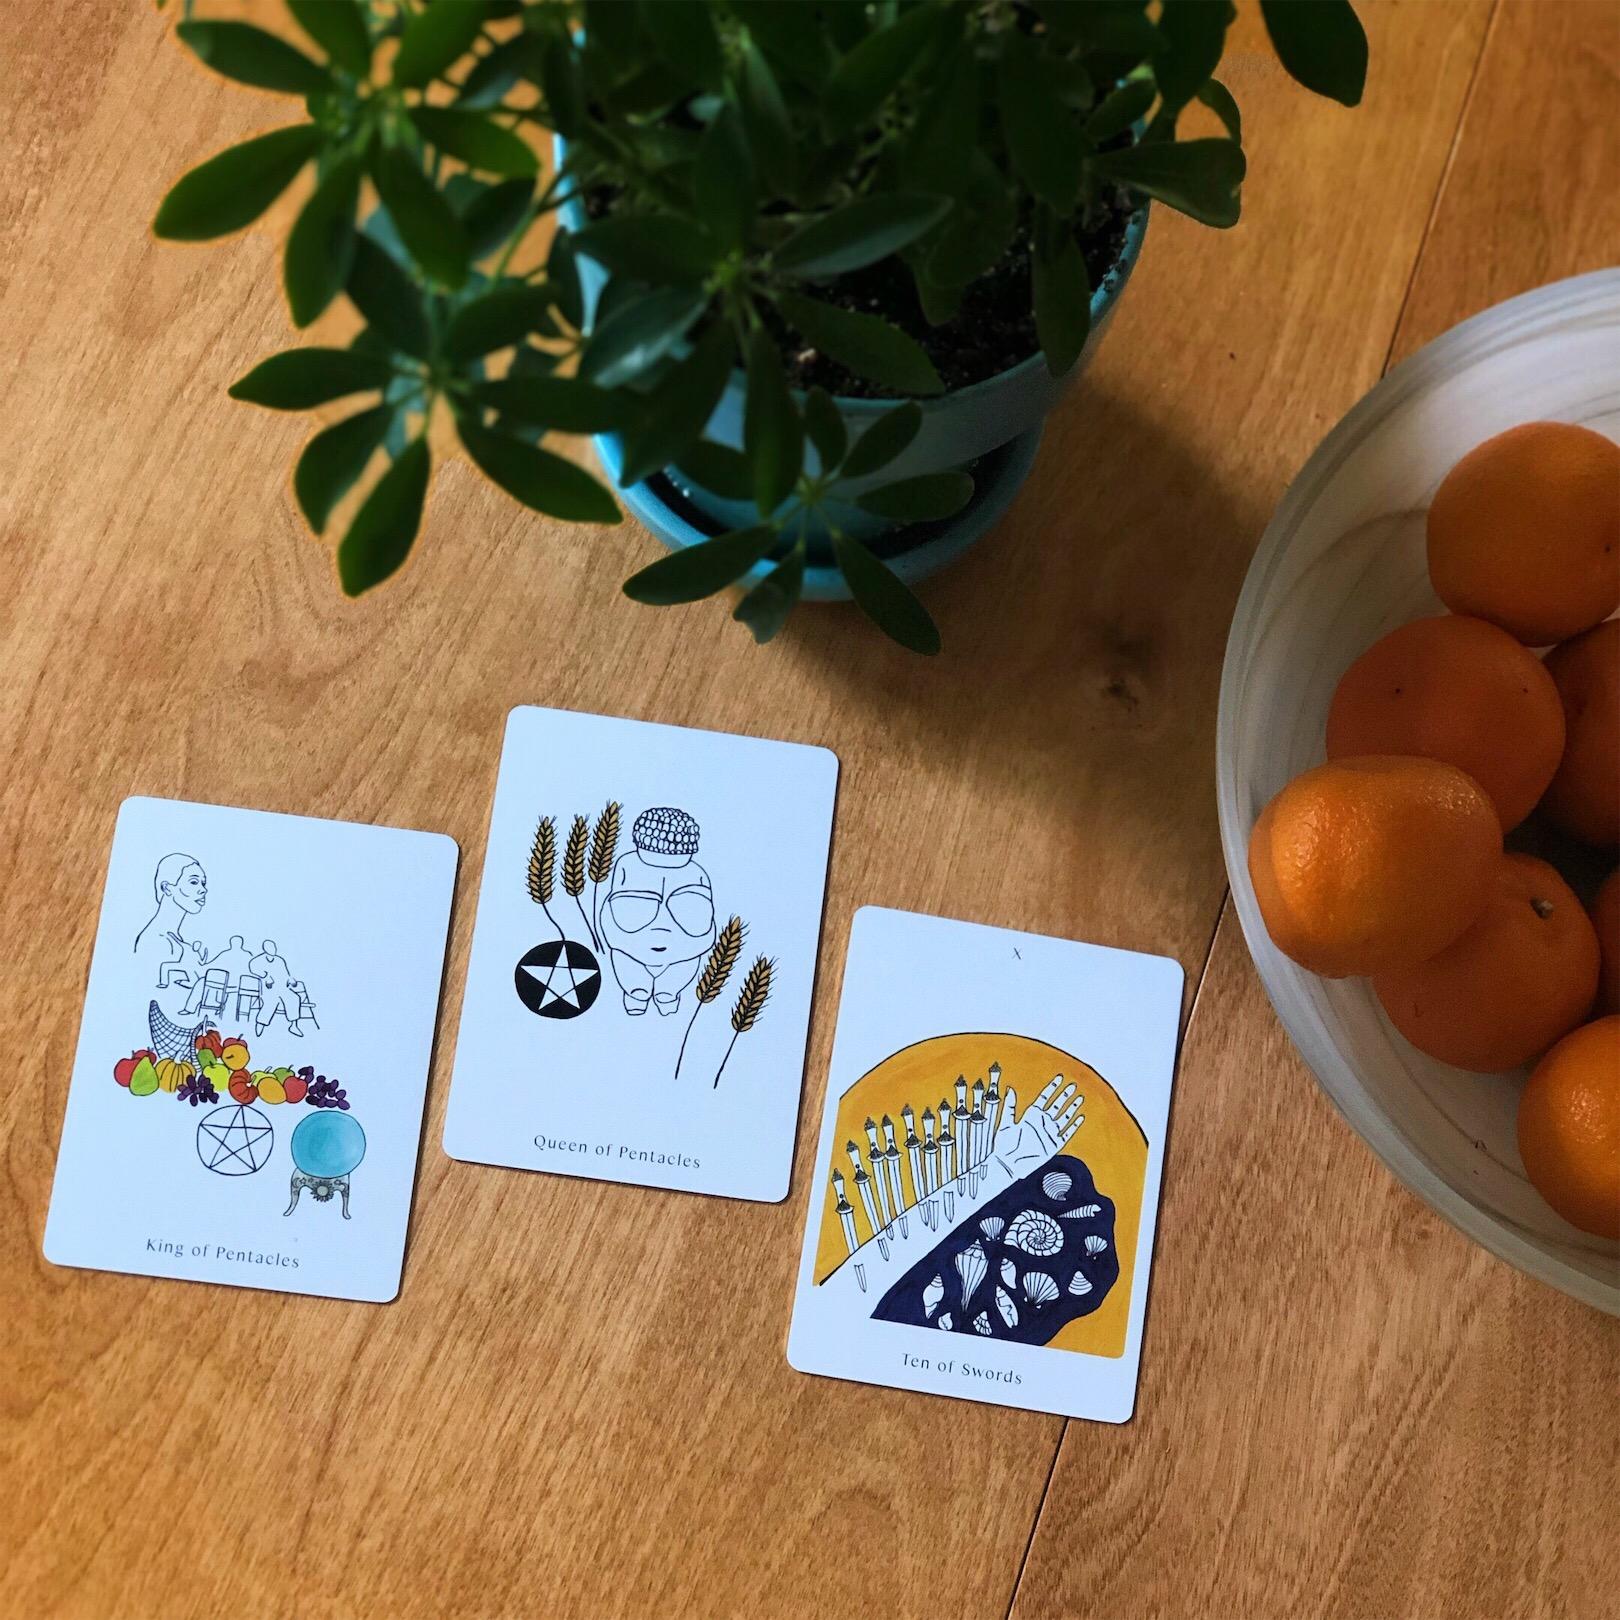 Three Card Tarot Spread Apparition Tarot Deck Pentacles Spirit Speak